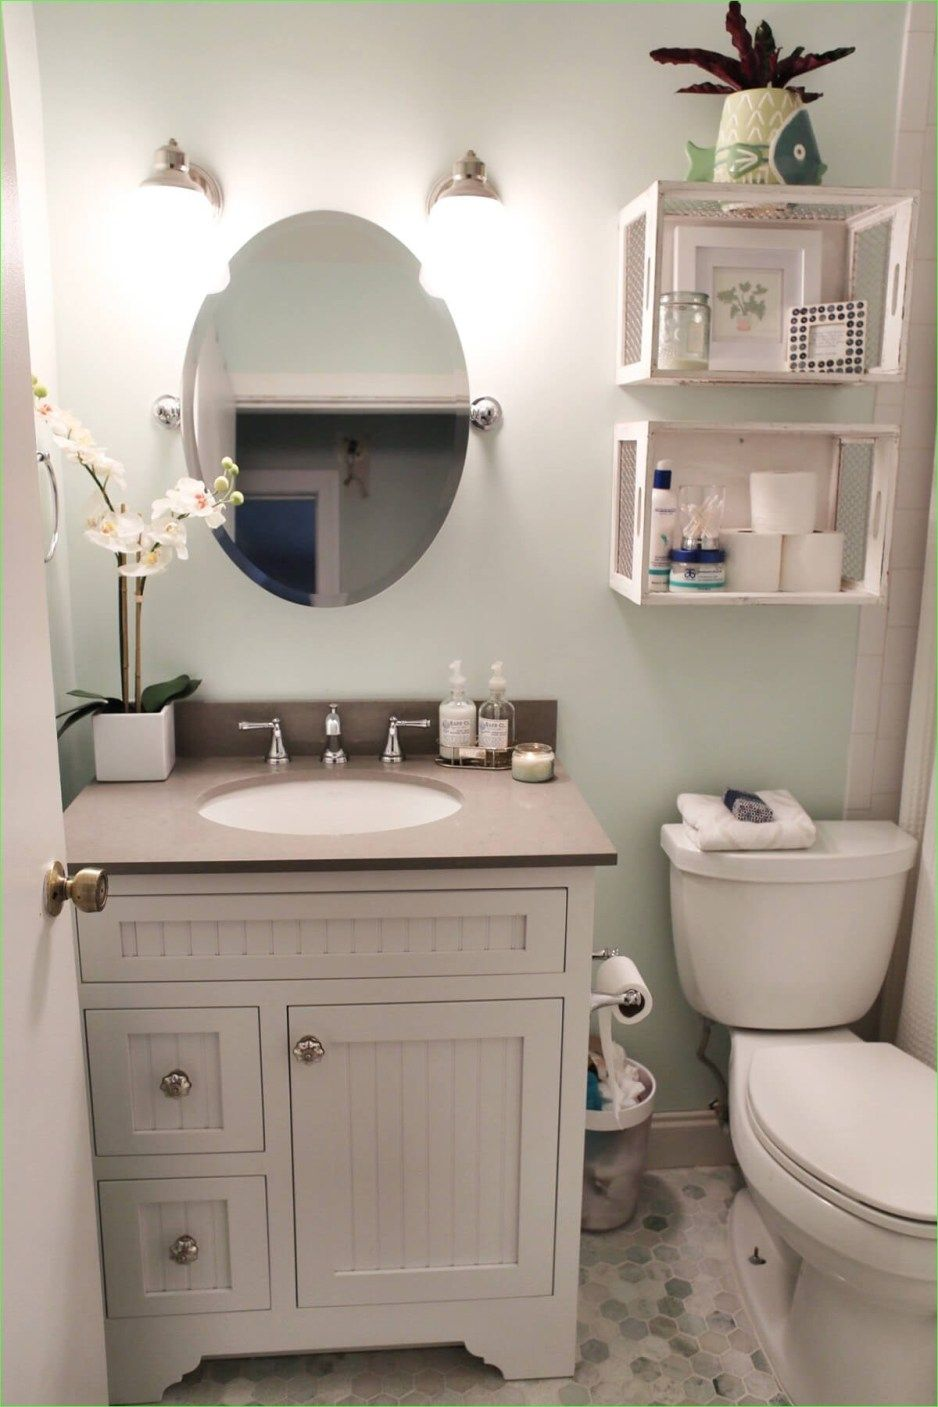 Yes You Can Make Brilliant Ideas Above Toilet Bathroom Decor Daily Home List Small Bathroom Diy Beautiful Bathroom Designs Small Bathroom Decor